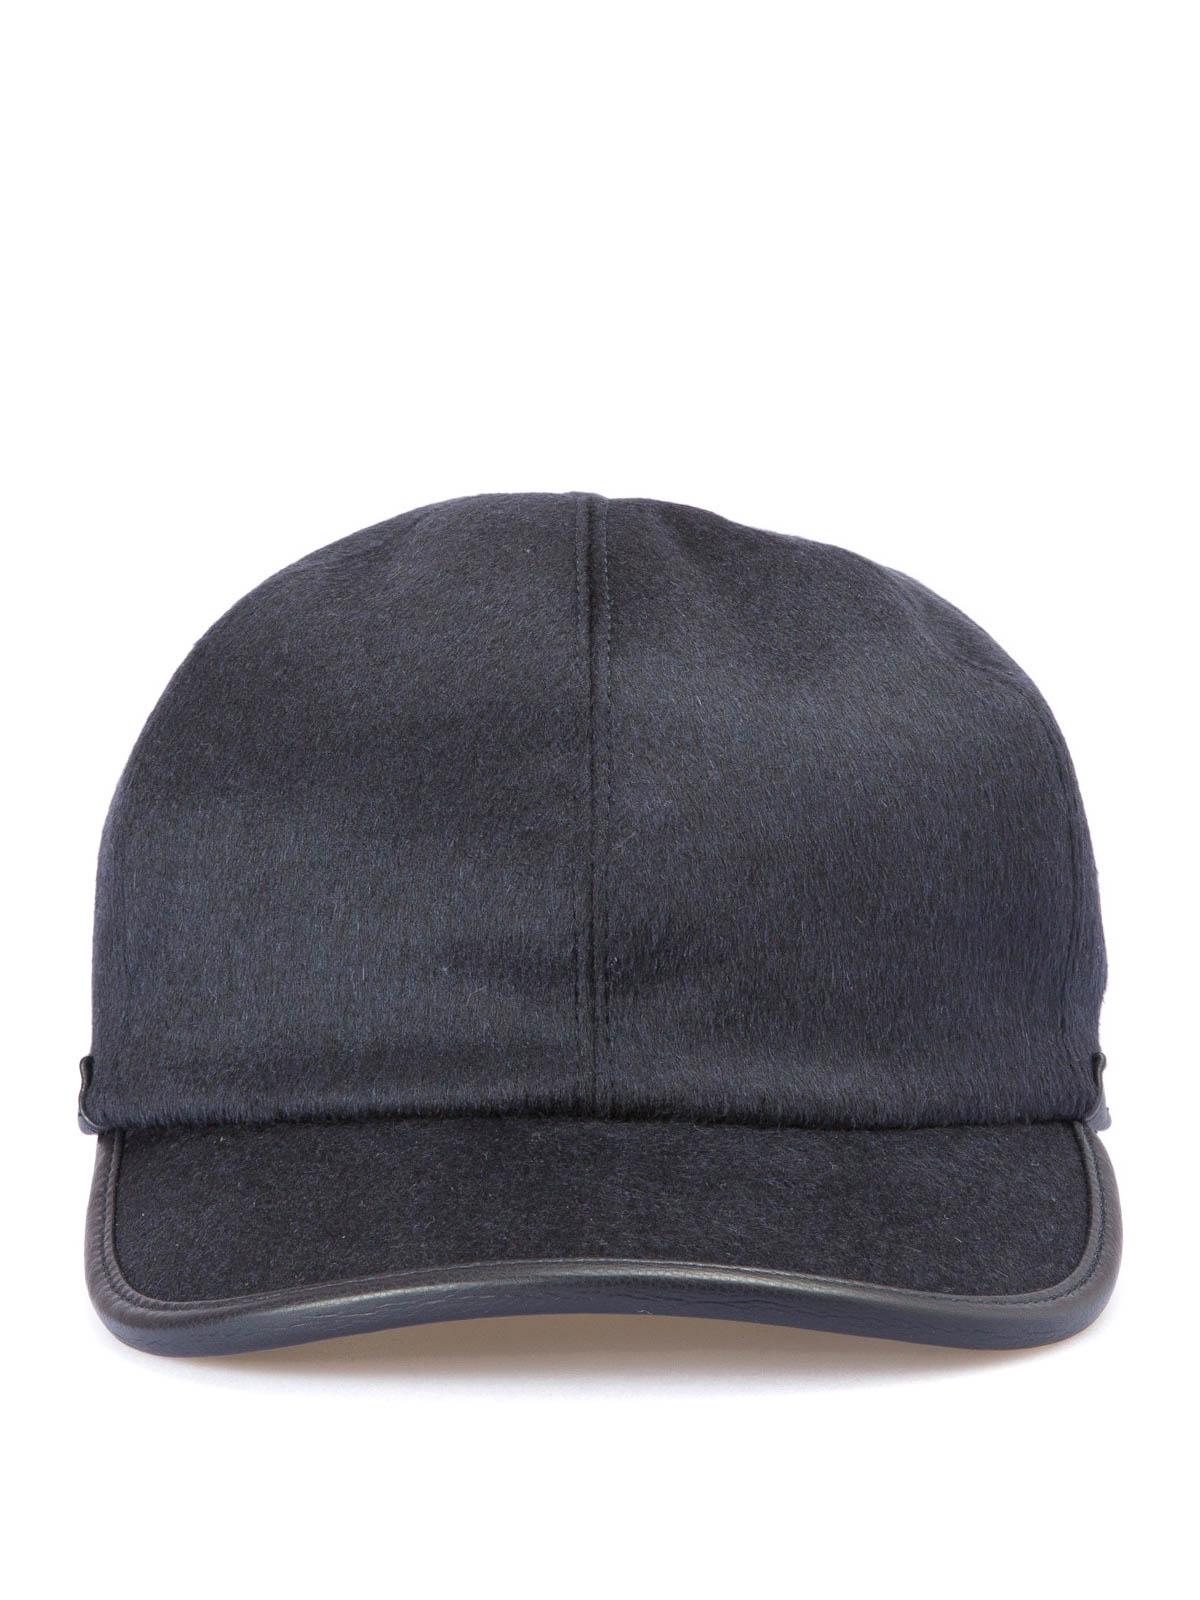 aedcac9954c Brioni - Wool blend baseball cap - hats   caps - O4440M O3AR6 4100